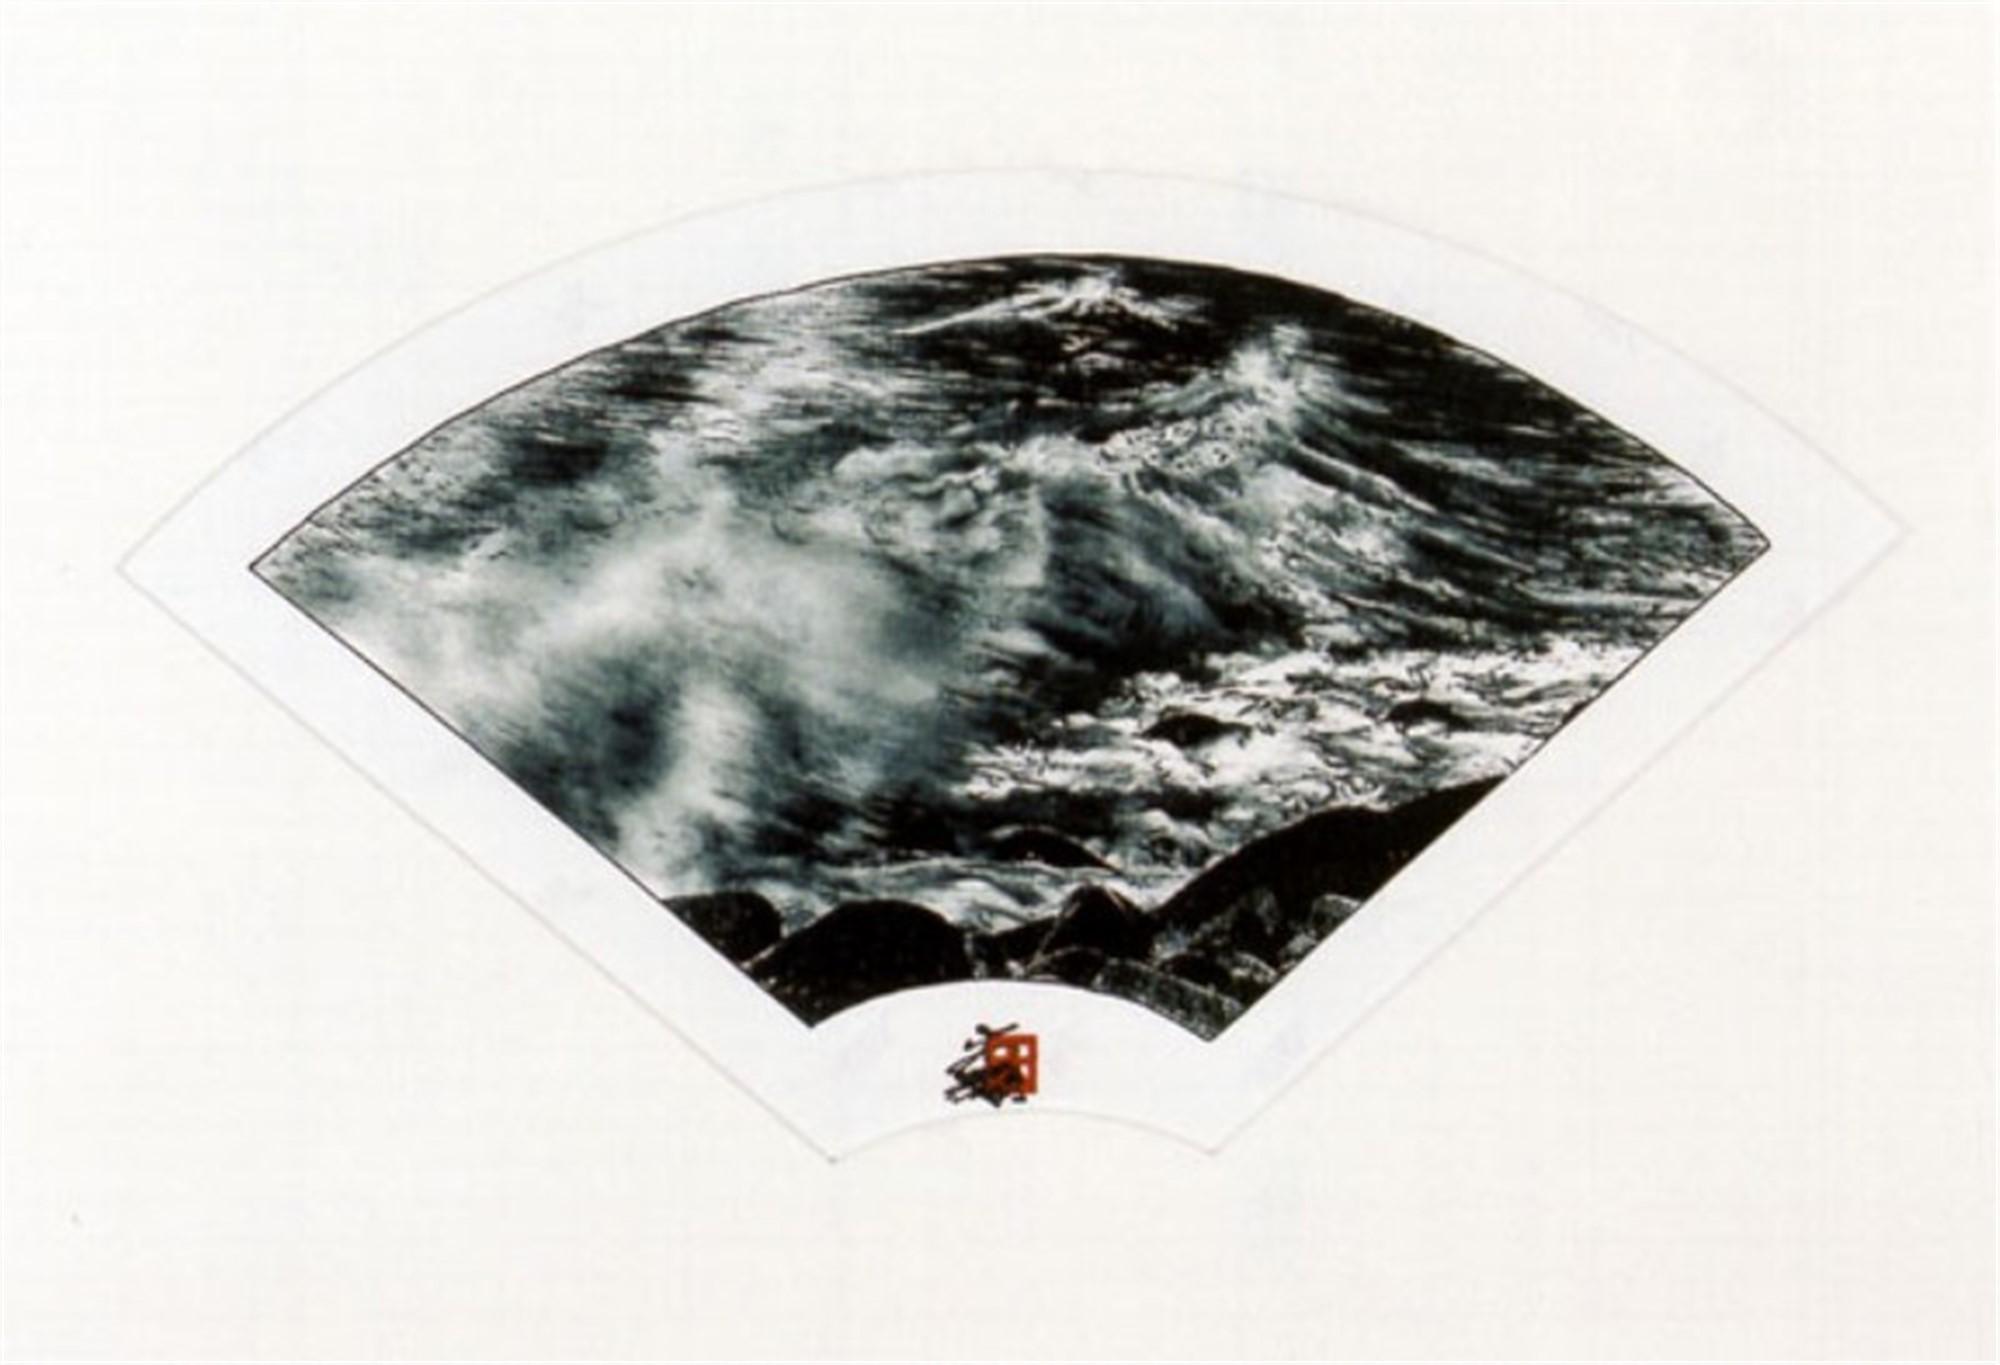 Fan - B/W Wave Passing By by Hisashi Otsuka